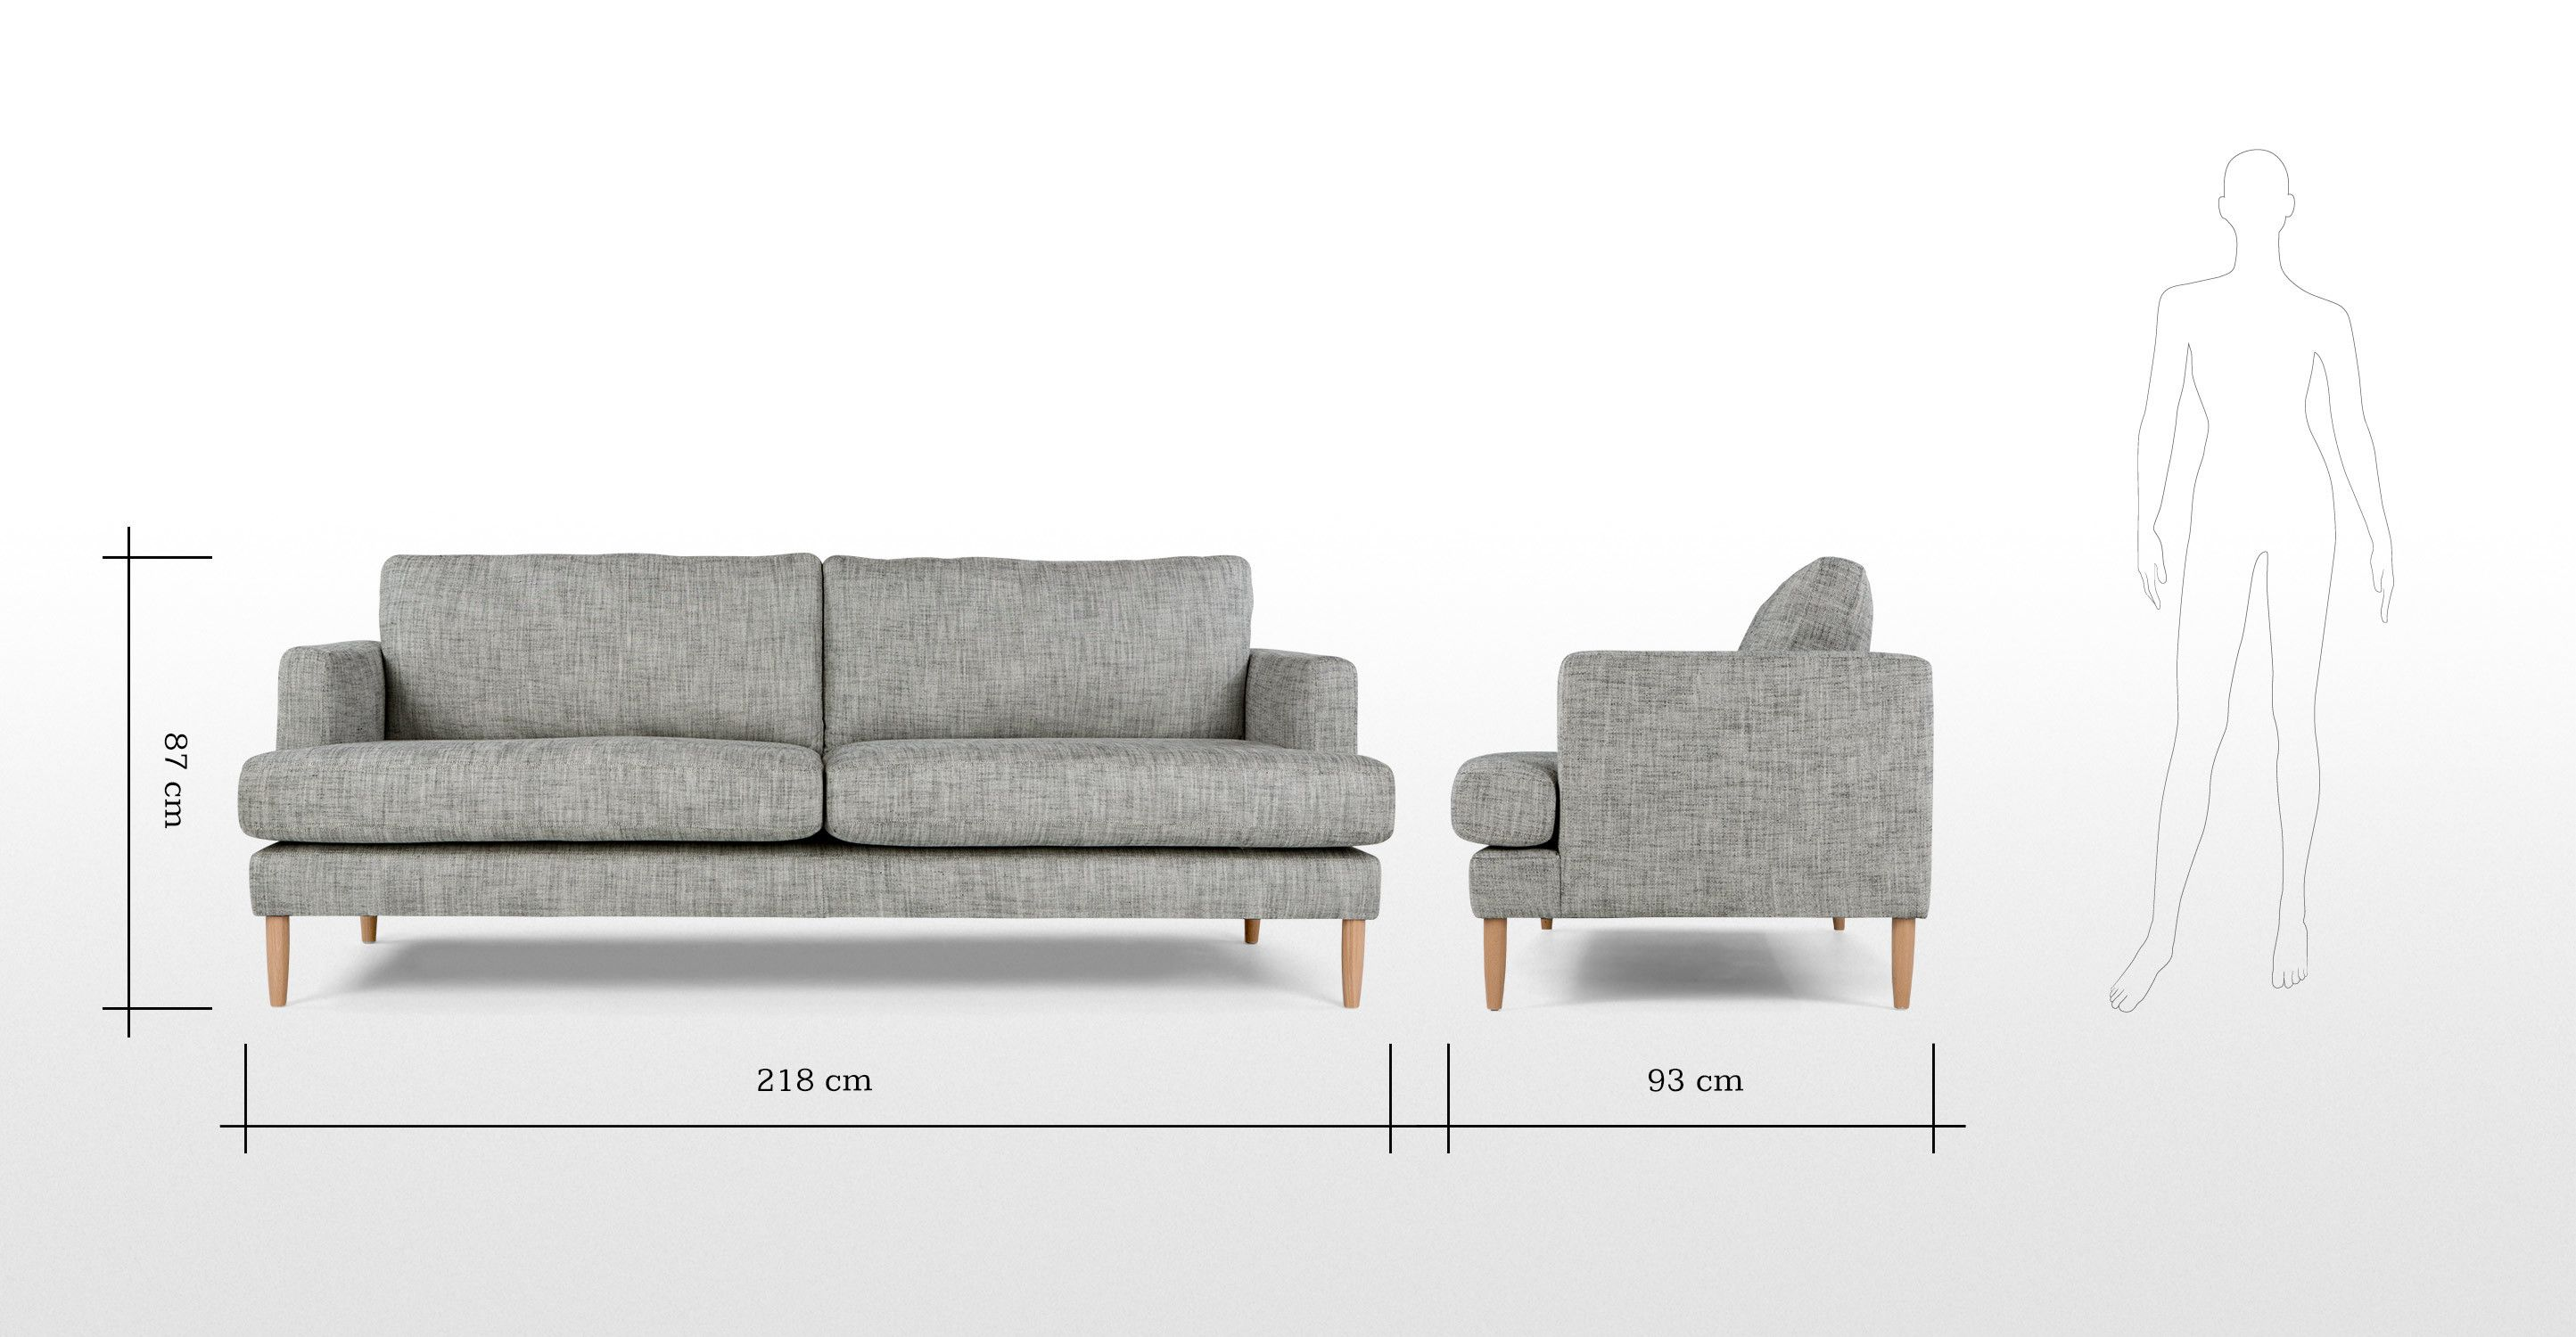 Wolseley 3 Seater Sofa Wolf Grey made